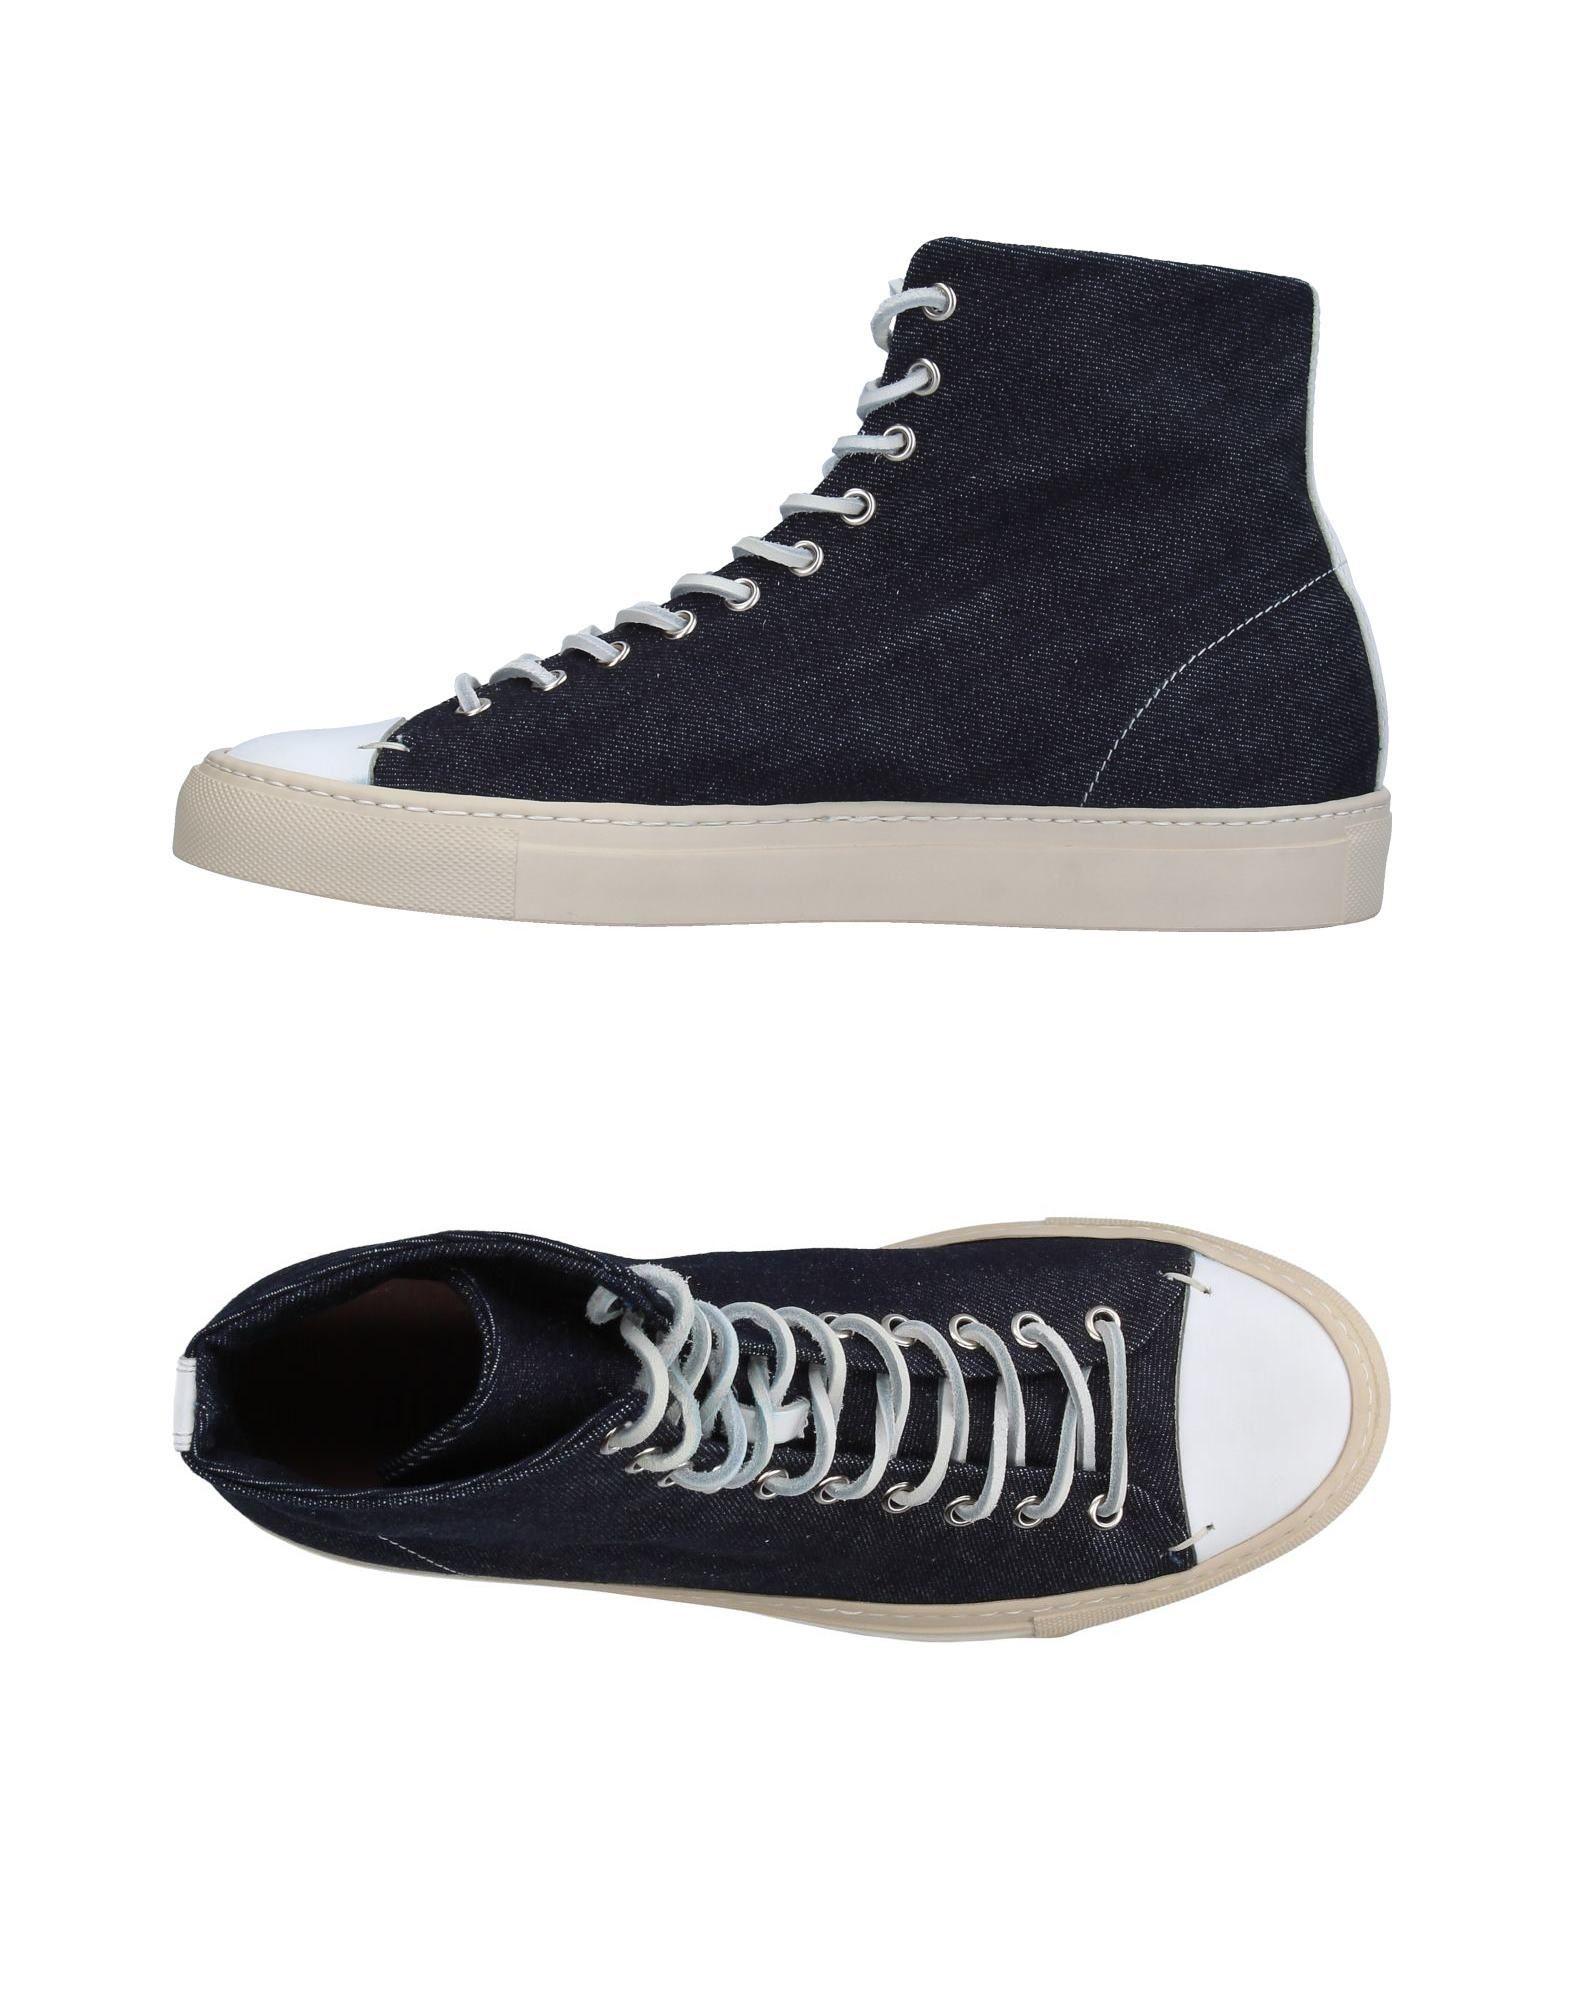 Buttero® Sneakers Damen Damen Damen  11259077CM Heiße Schuhe 6c93ec